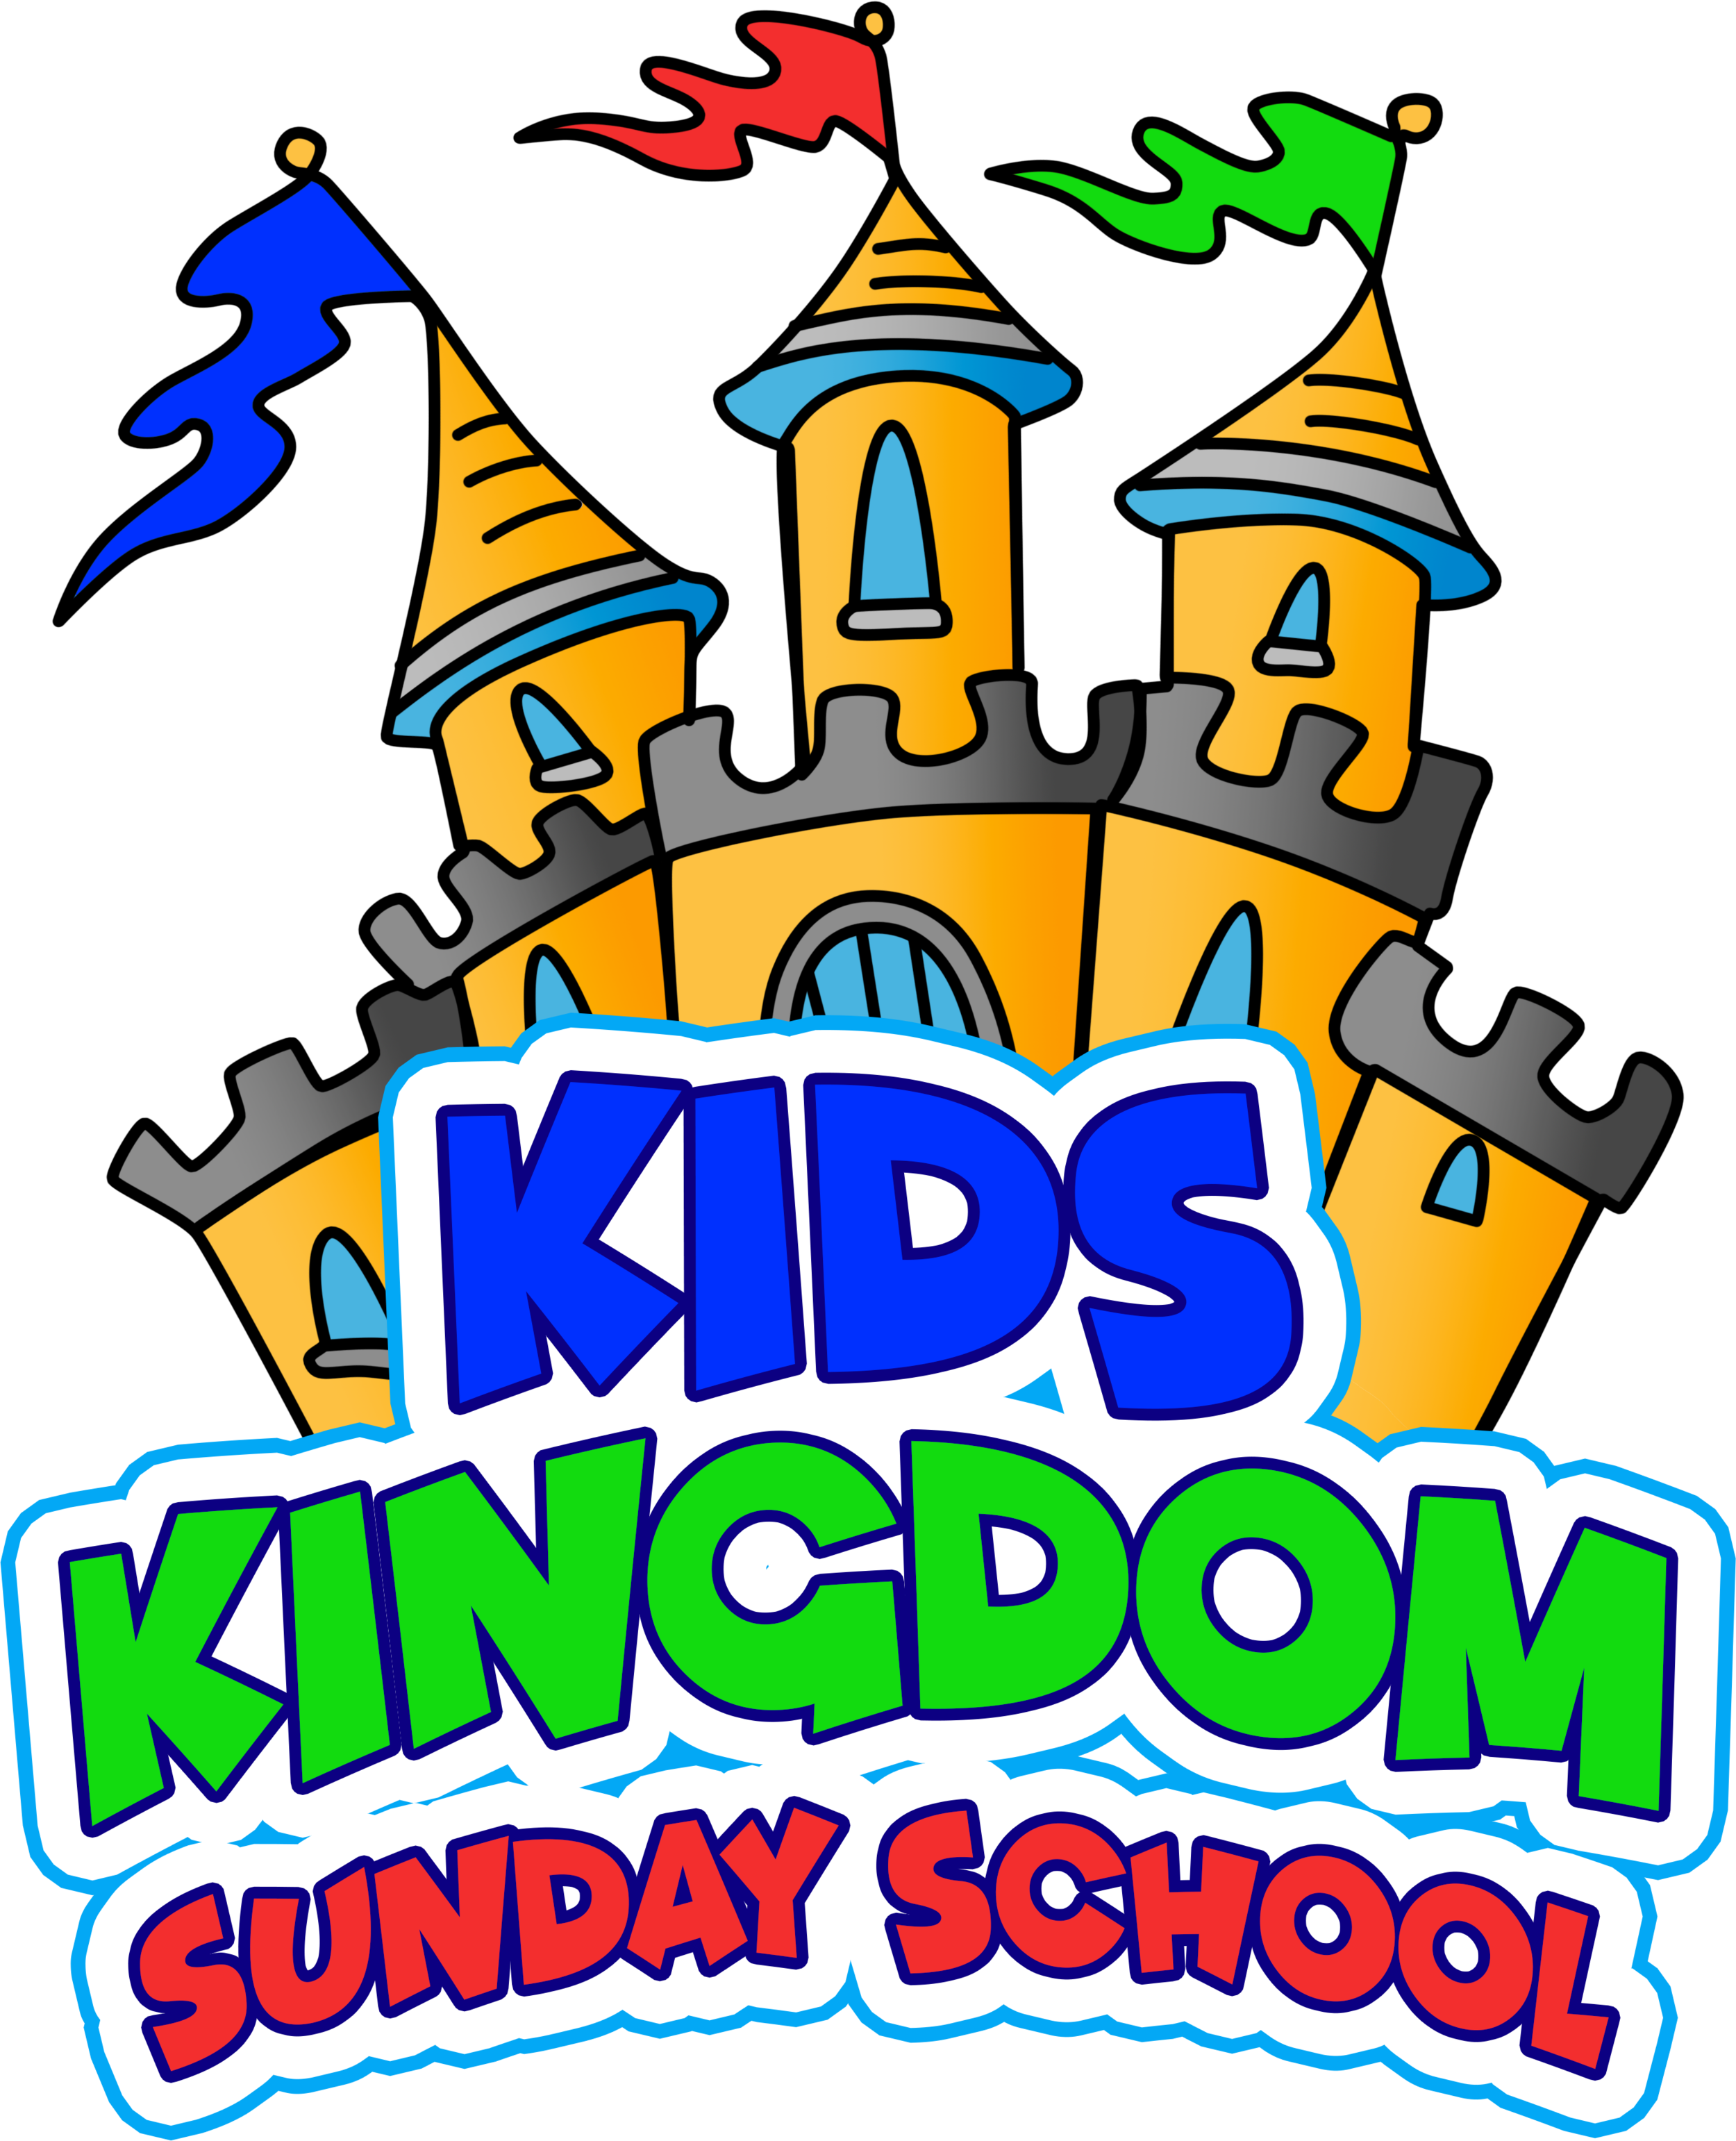 Sunday School Kids Kingdom Logo.png